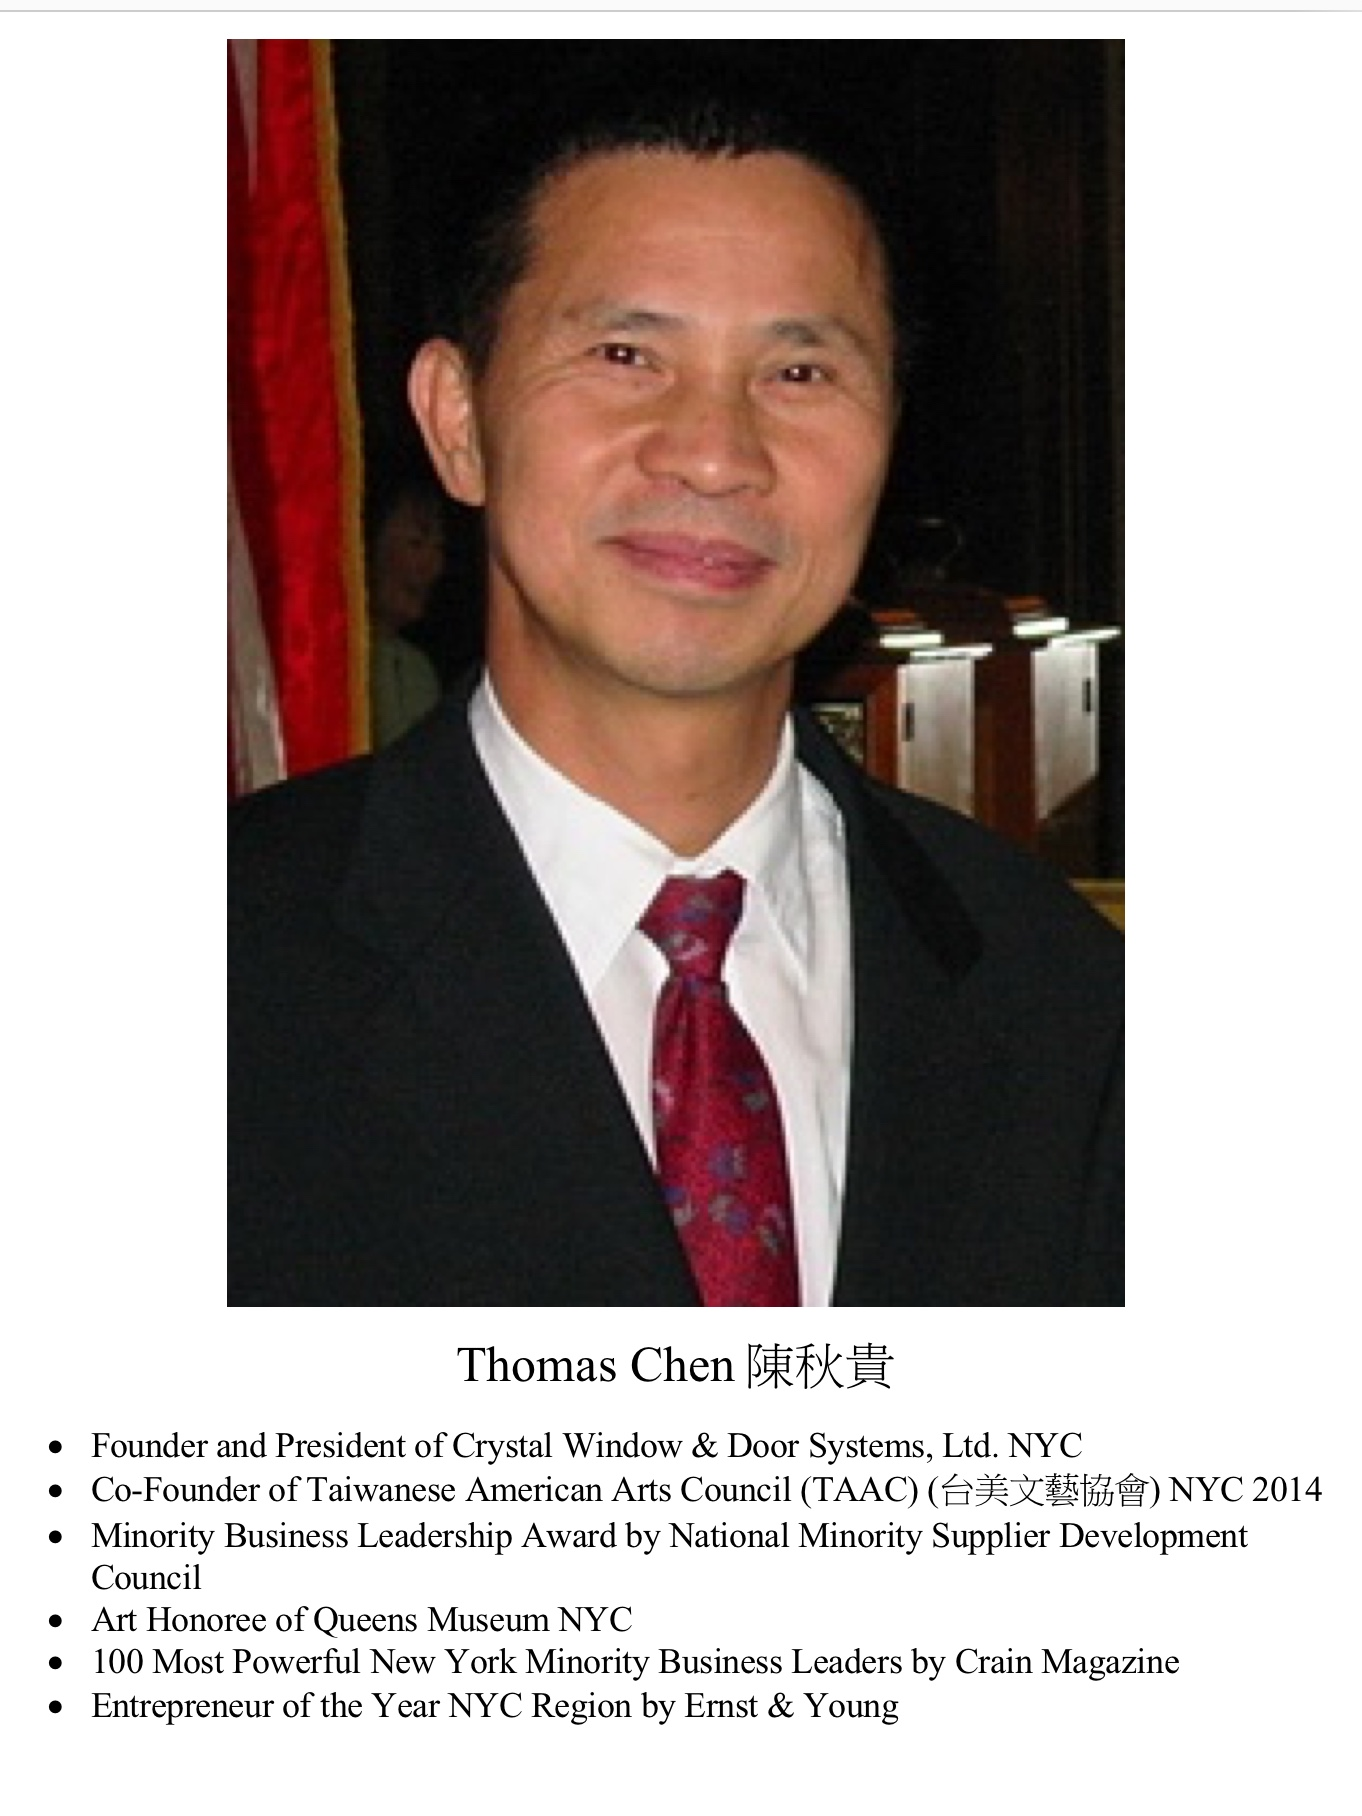 275. Thomas Chen 陳秋貴